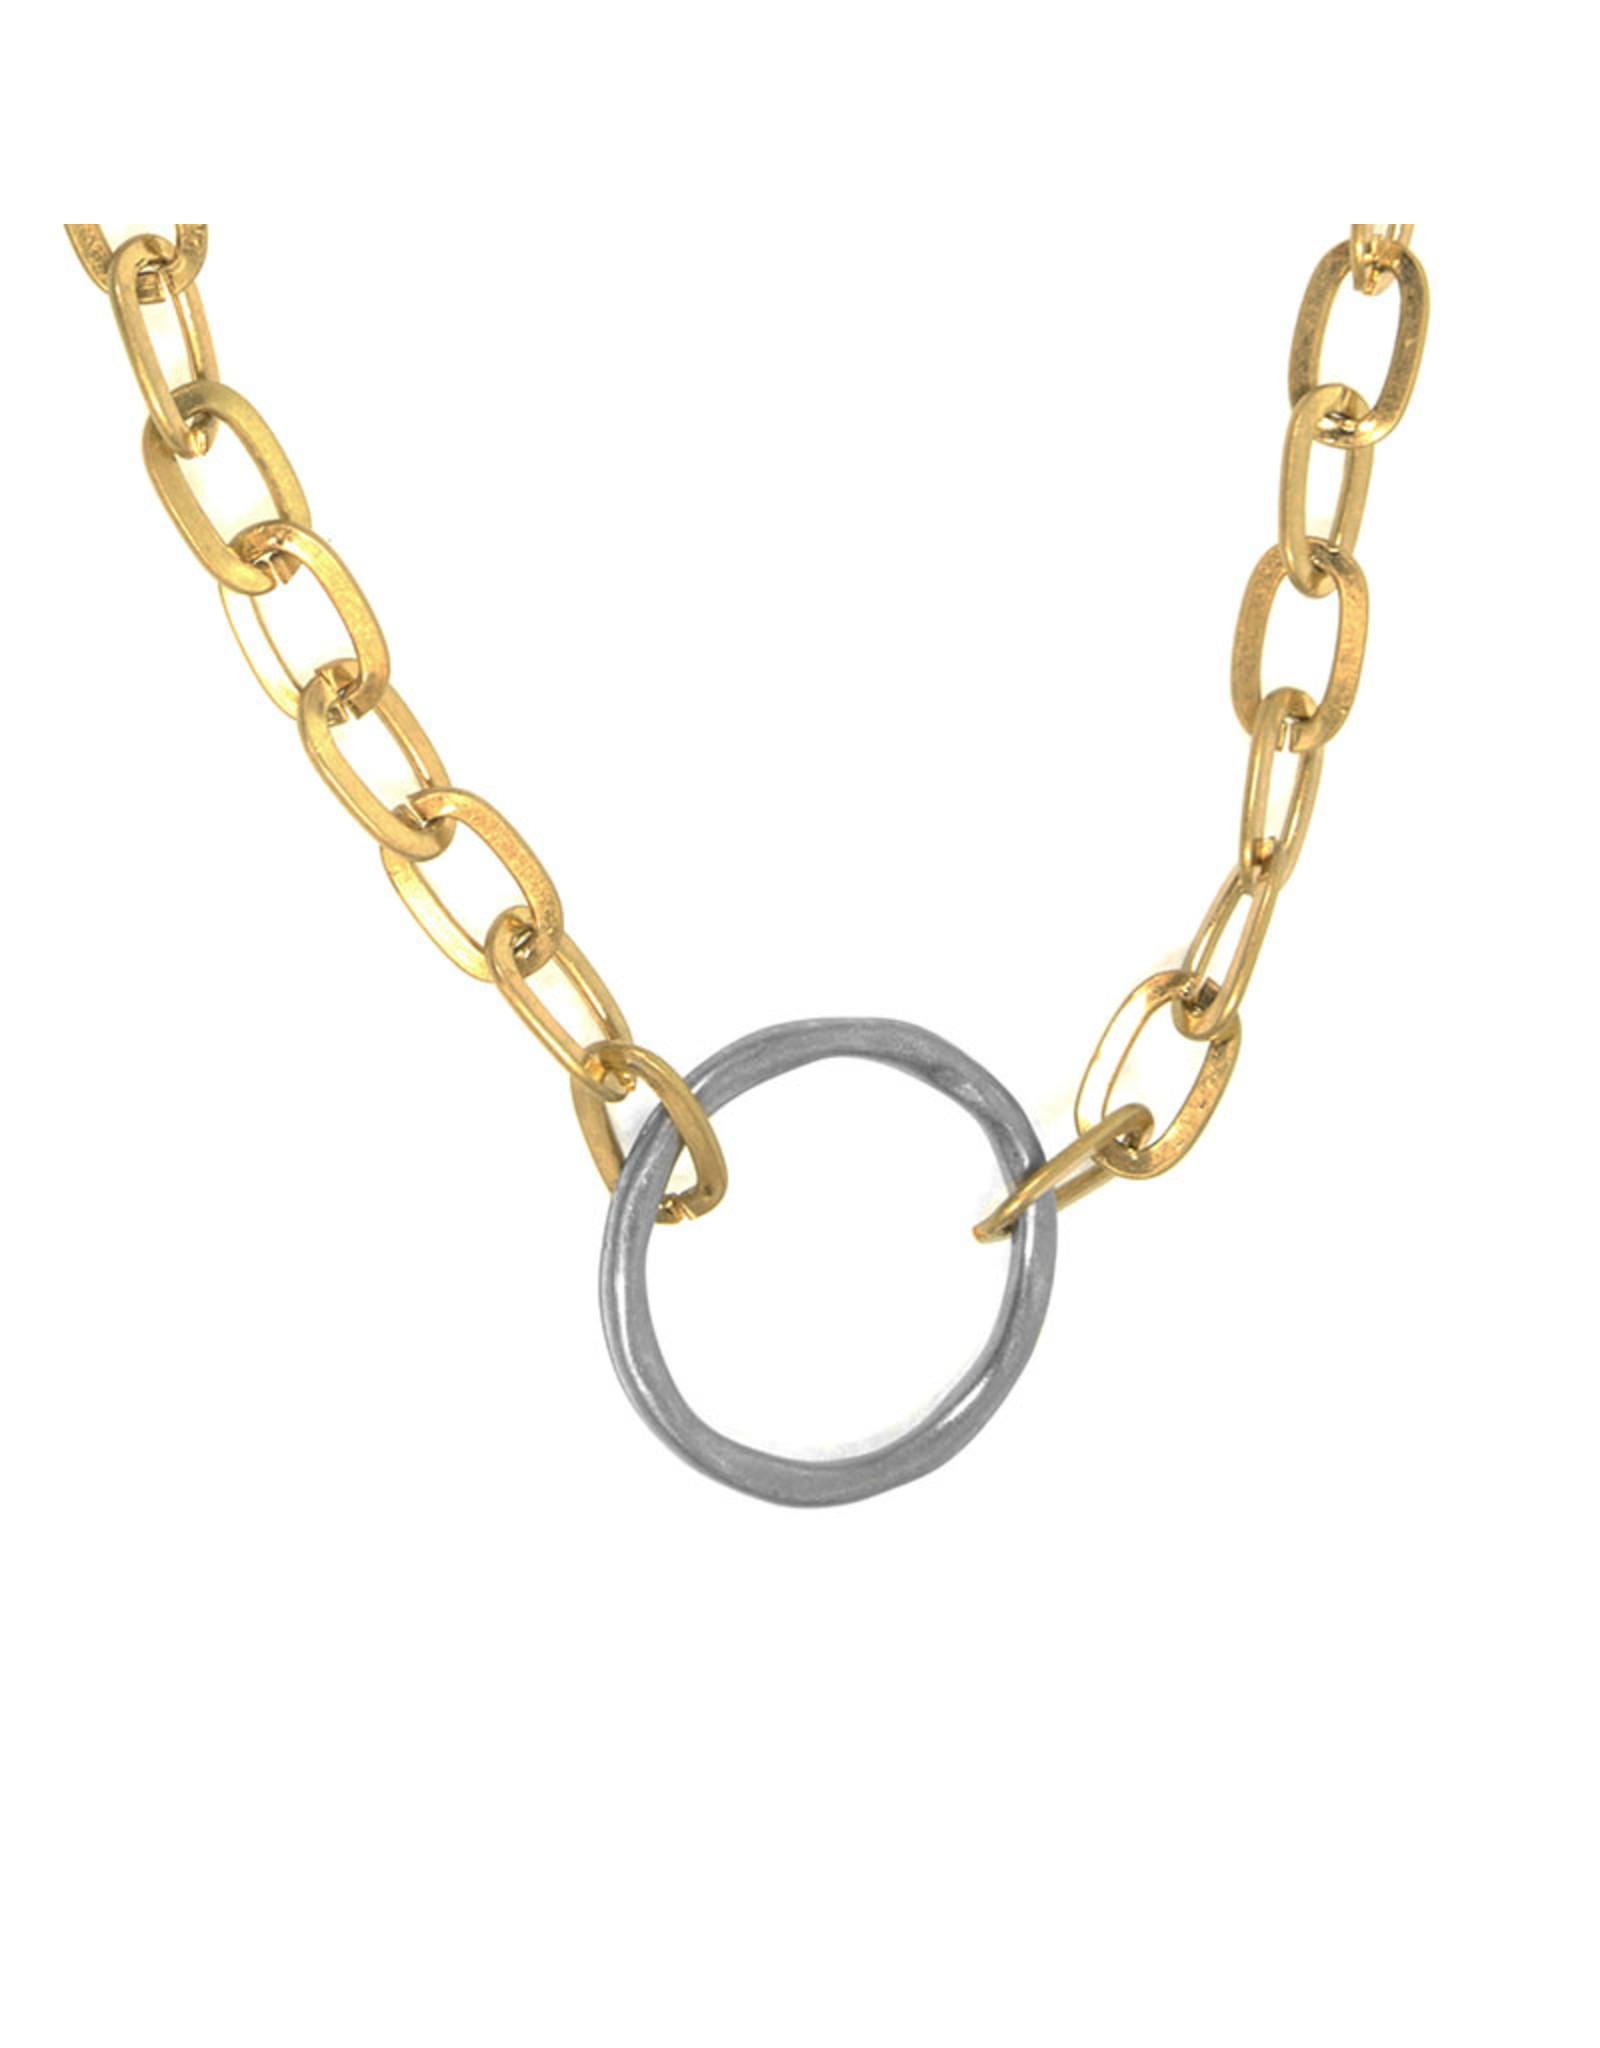 Joy Susan Link Ring Necklace